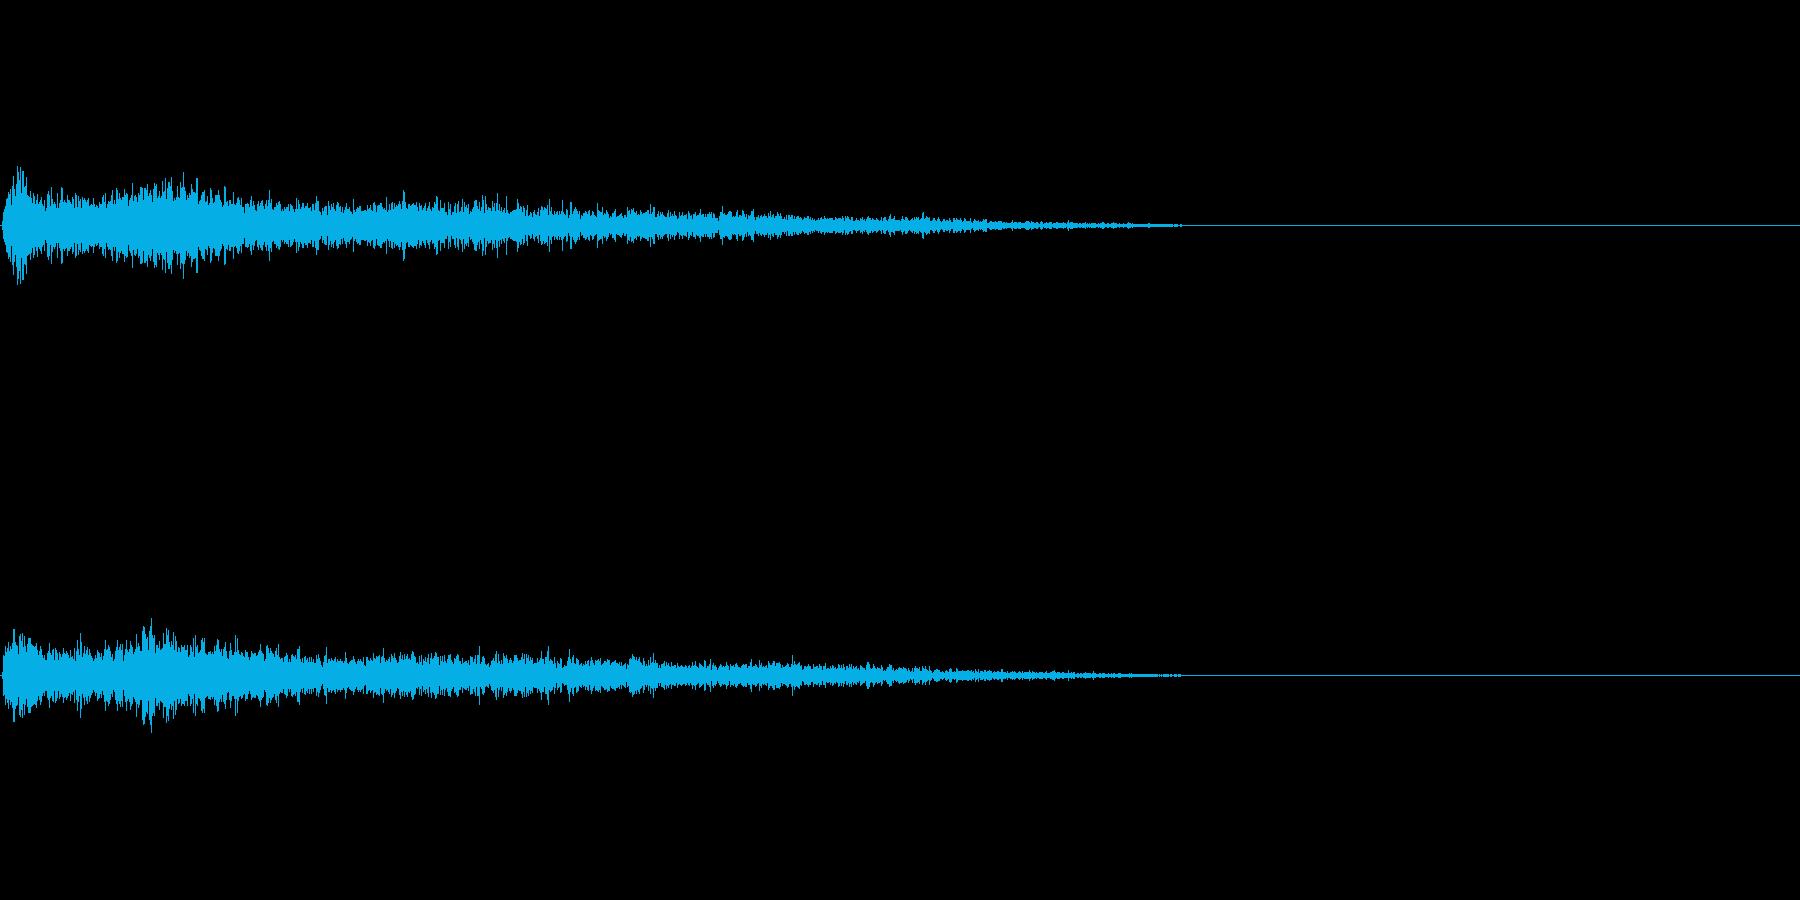 A♯マイナー インパクト音 衝撃音の再生済みの波形